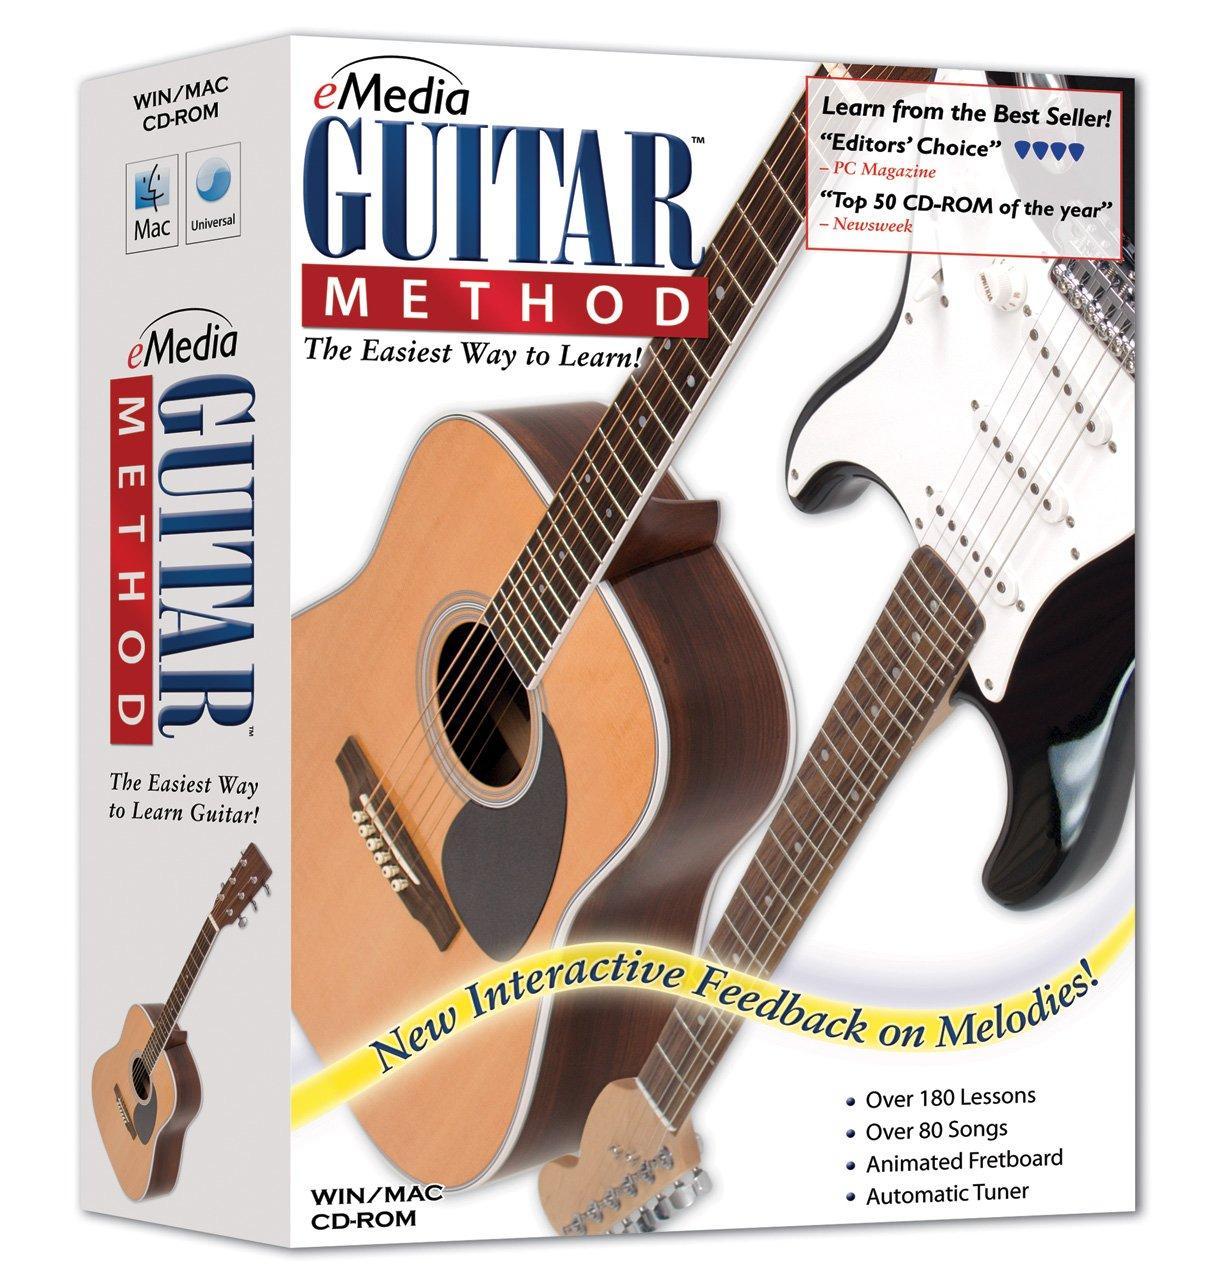 eMedia Guitar Method v5 [Old Version] by eMedia